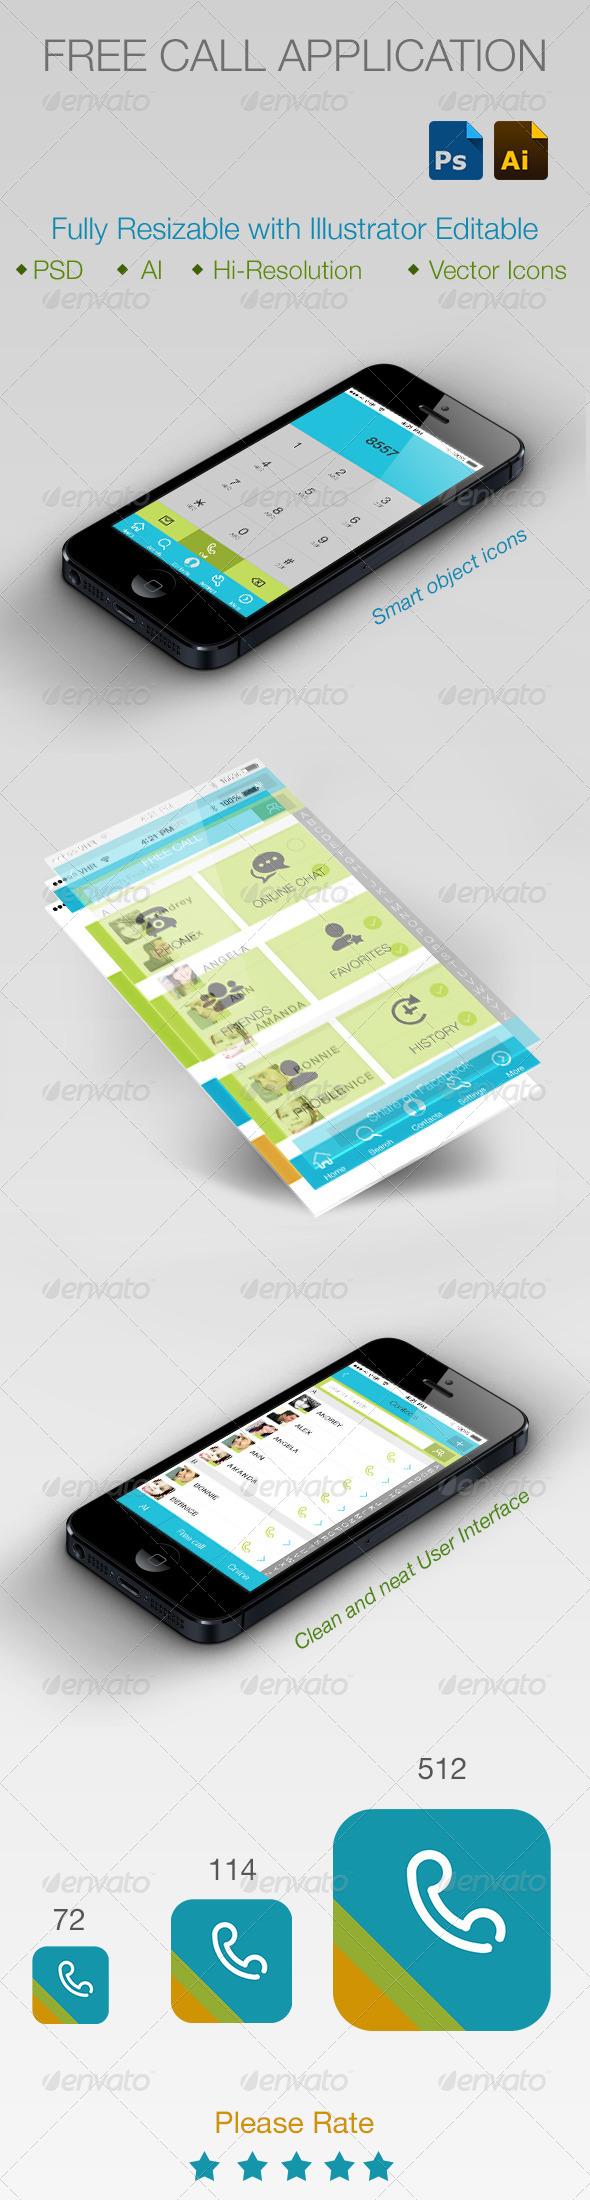 GraphicRiver Free Call Application Smartphone 5645799